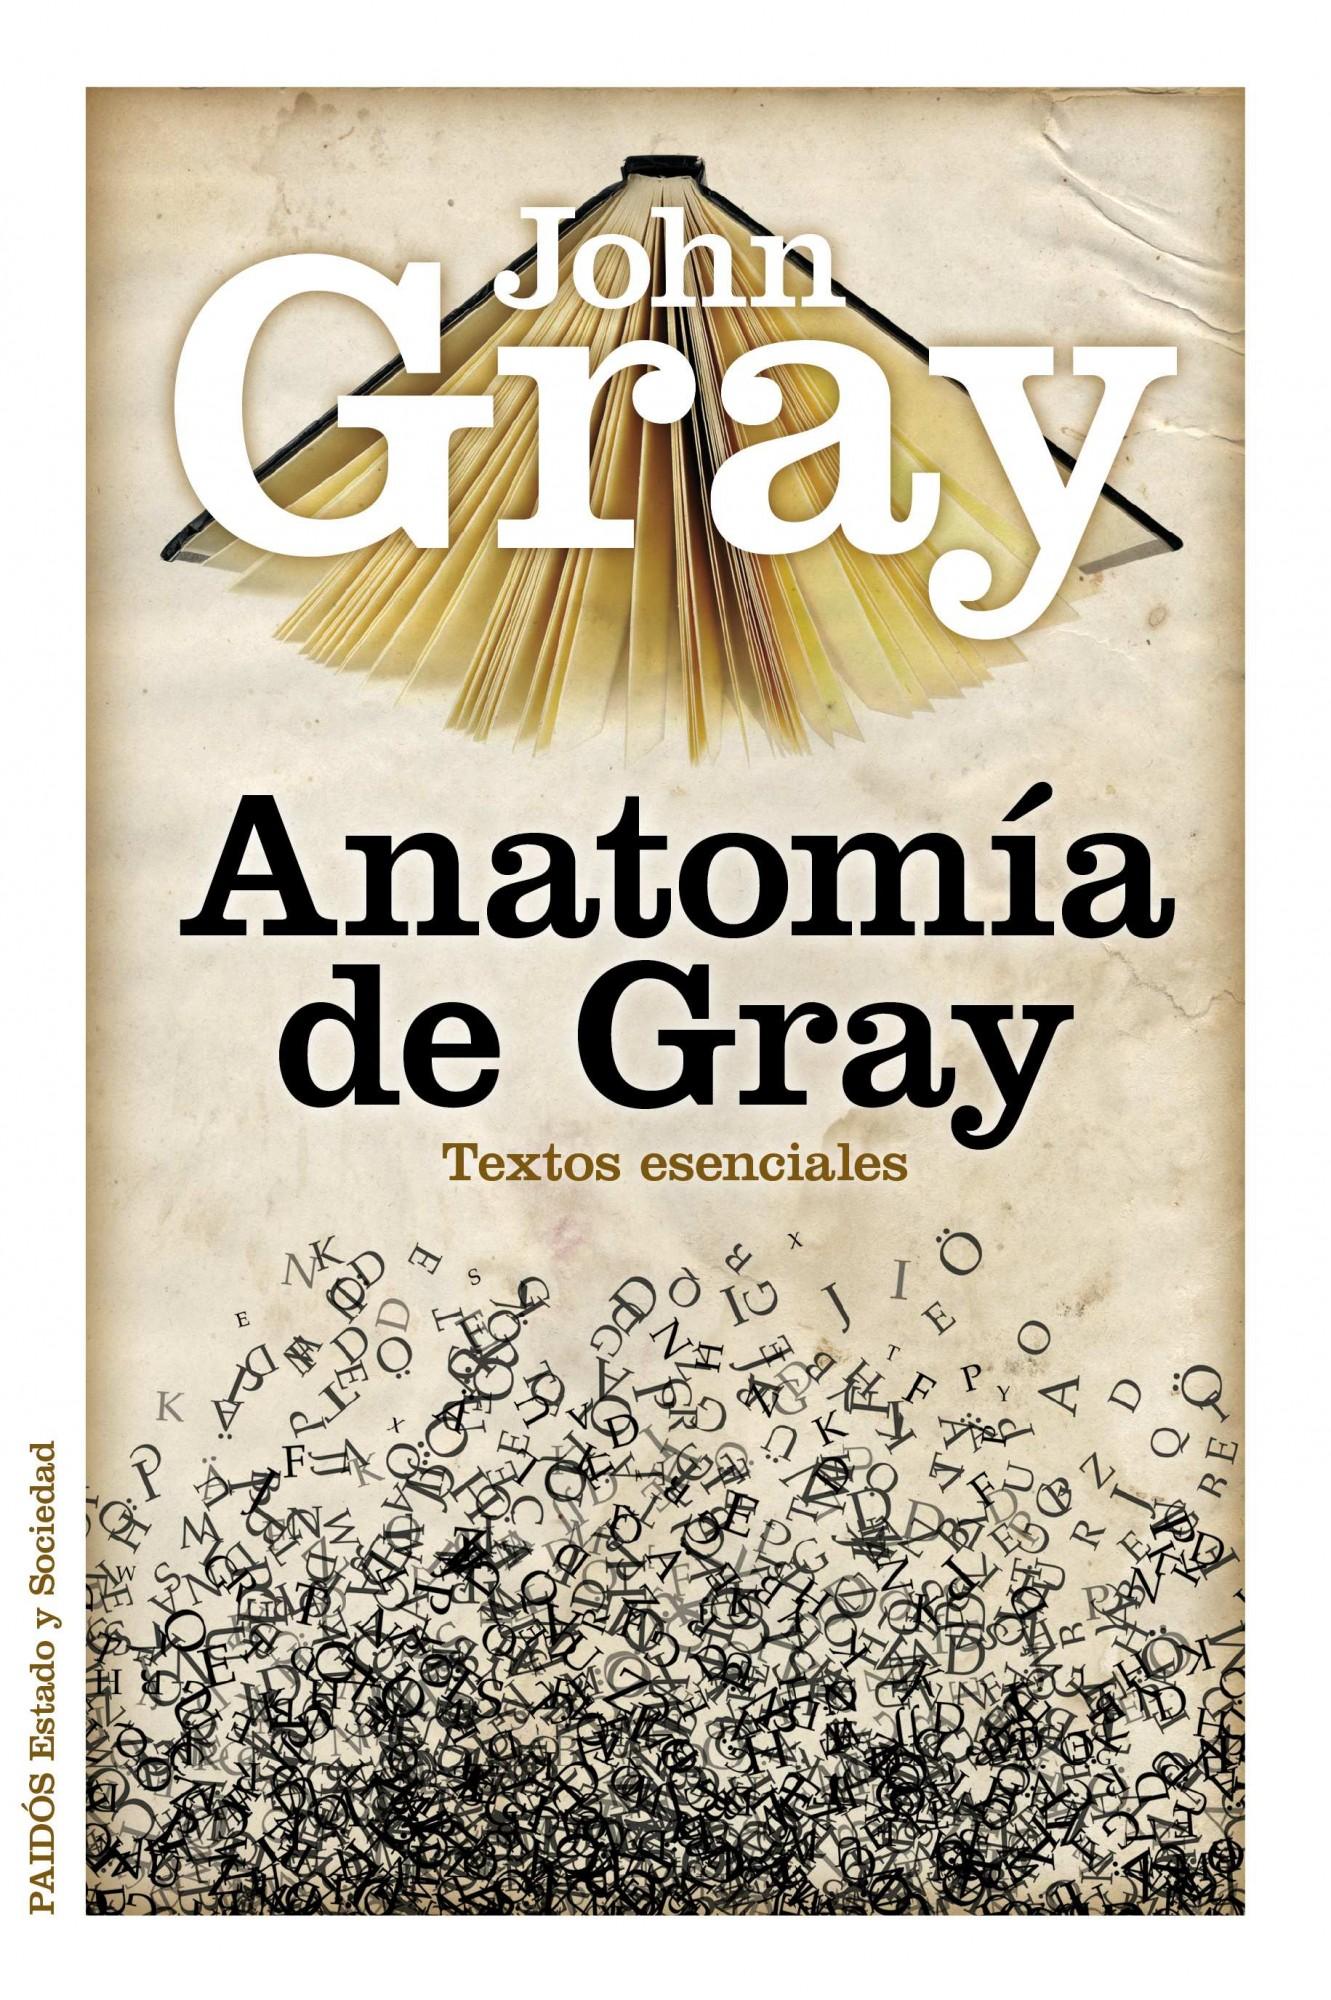 Anatomía de Gray | Katakrak